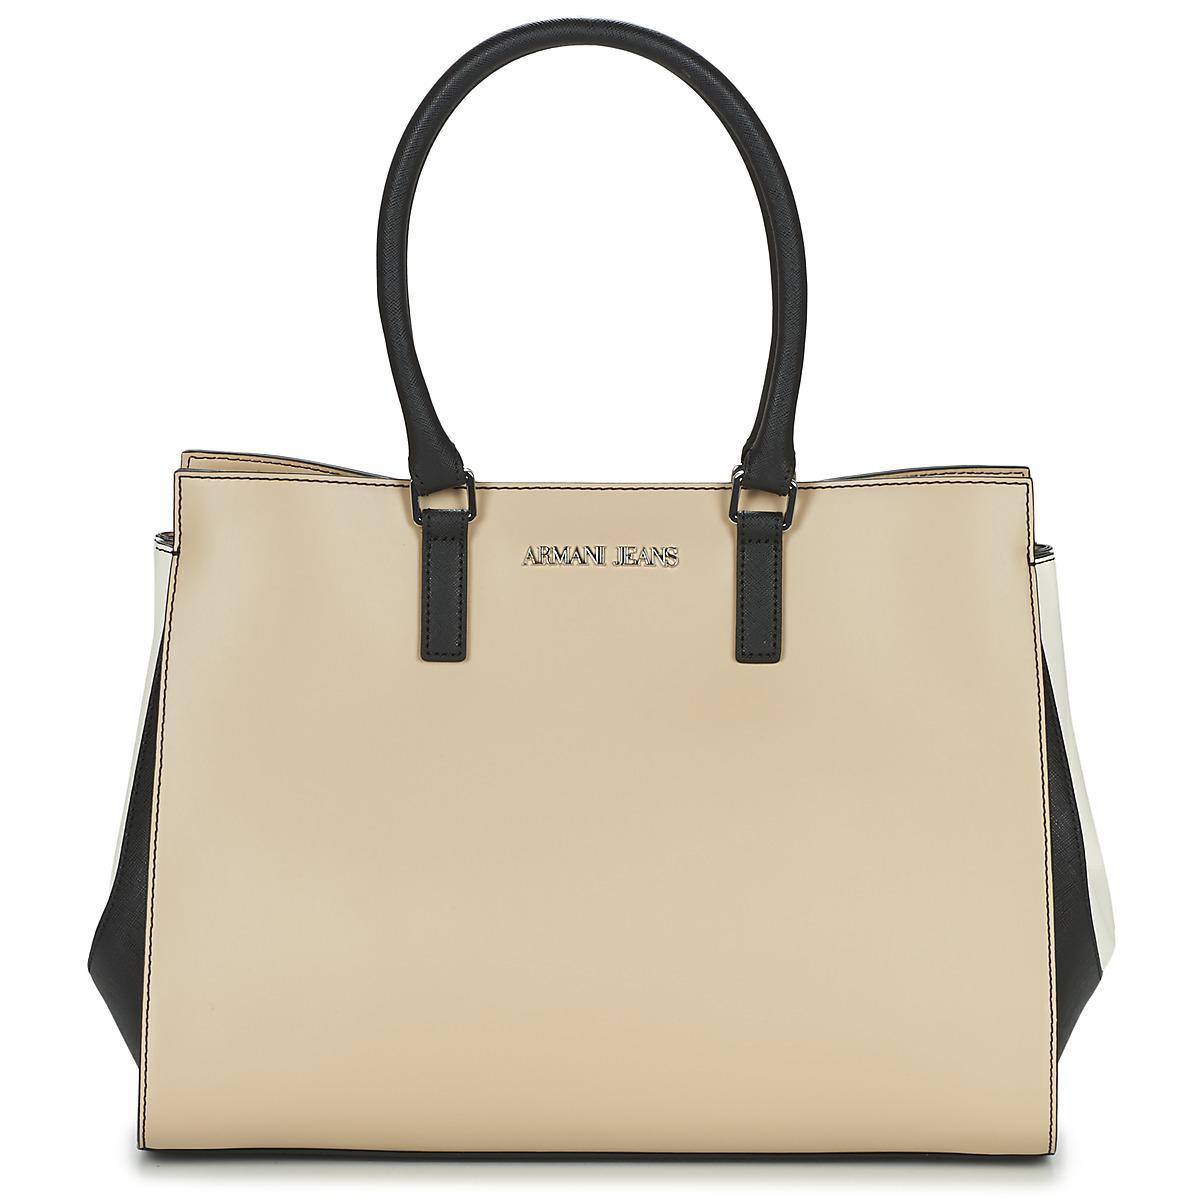 Armani Jeans Javotta Women s Shoulder Bag In Beige in Natural for ... e556adf812a0b